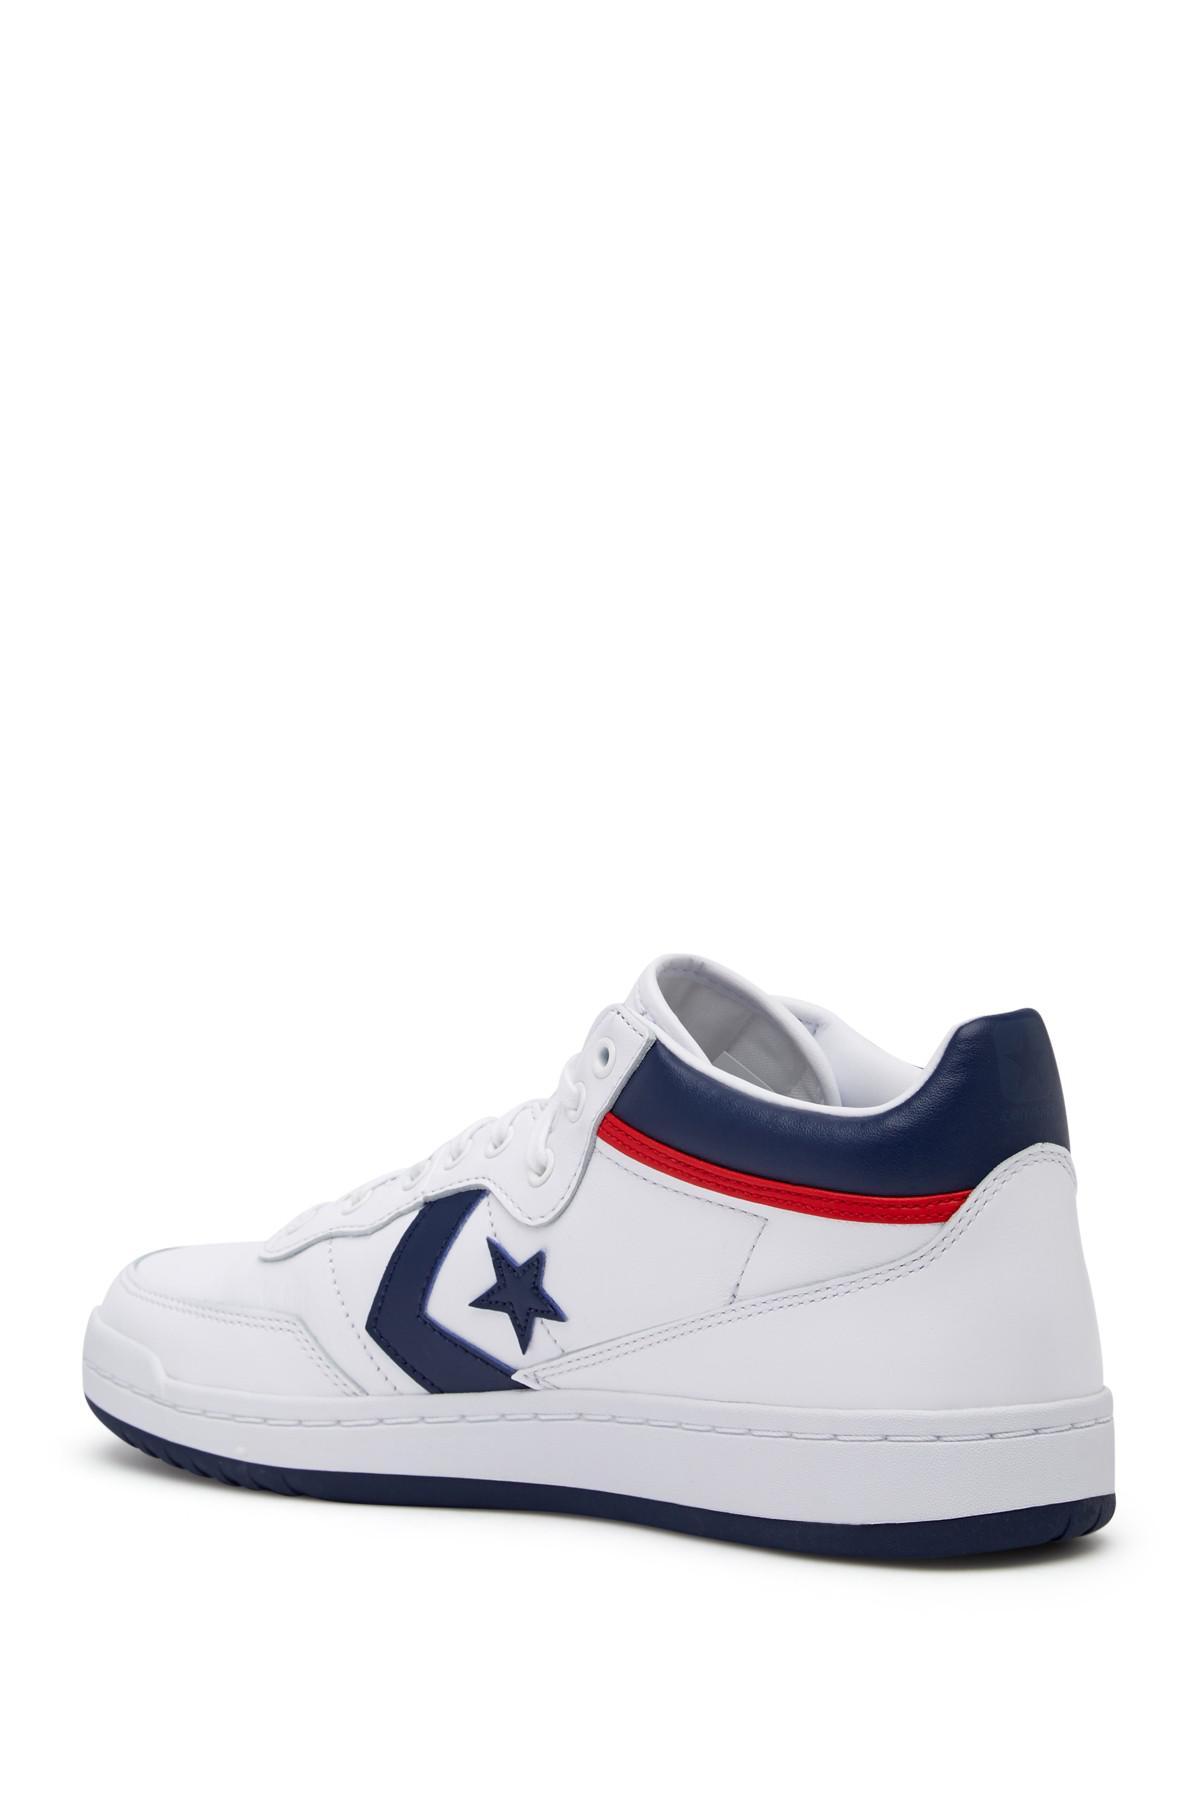 ... discount lyst converse fastbreak 83 mid leather sneaker unisex in blue  85b61 77f1f 26a64251e